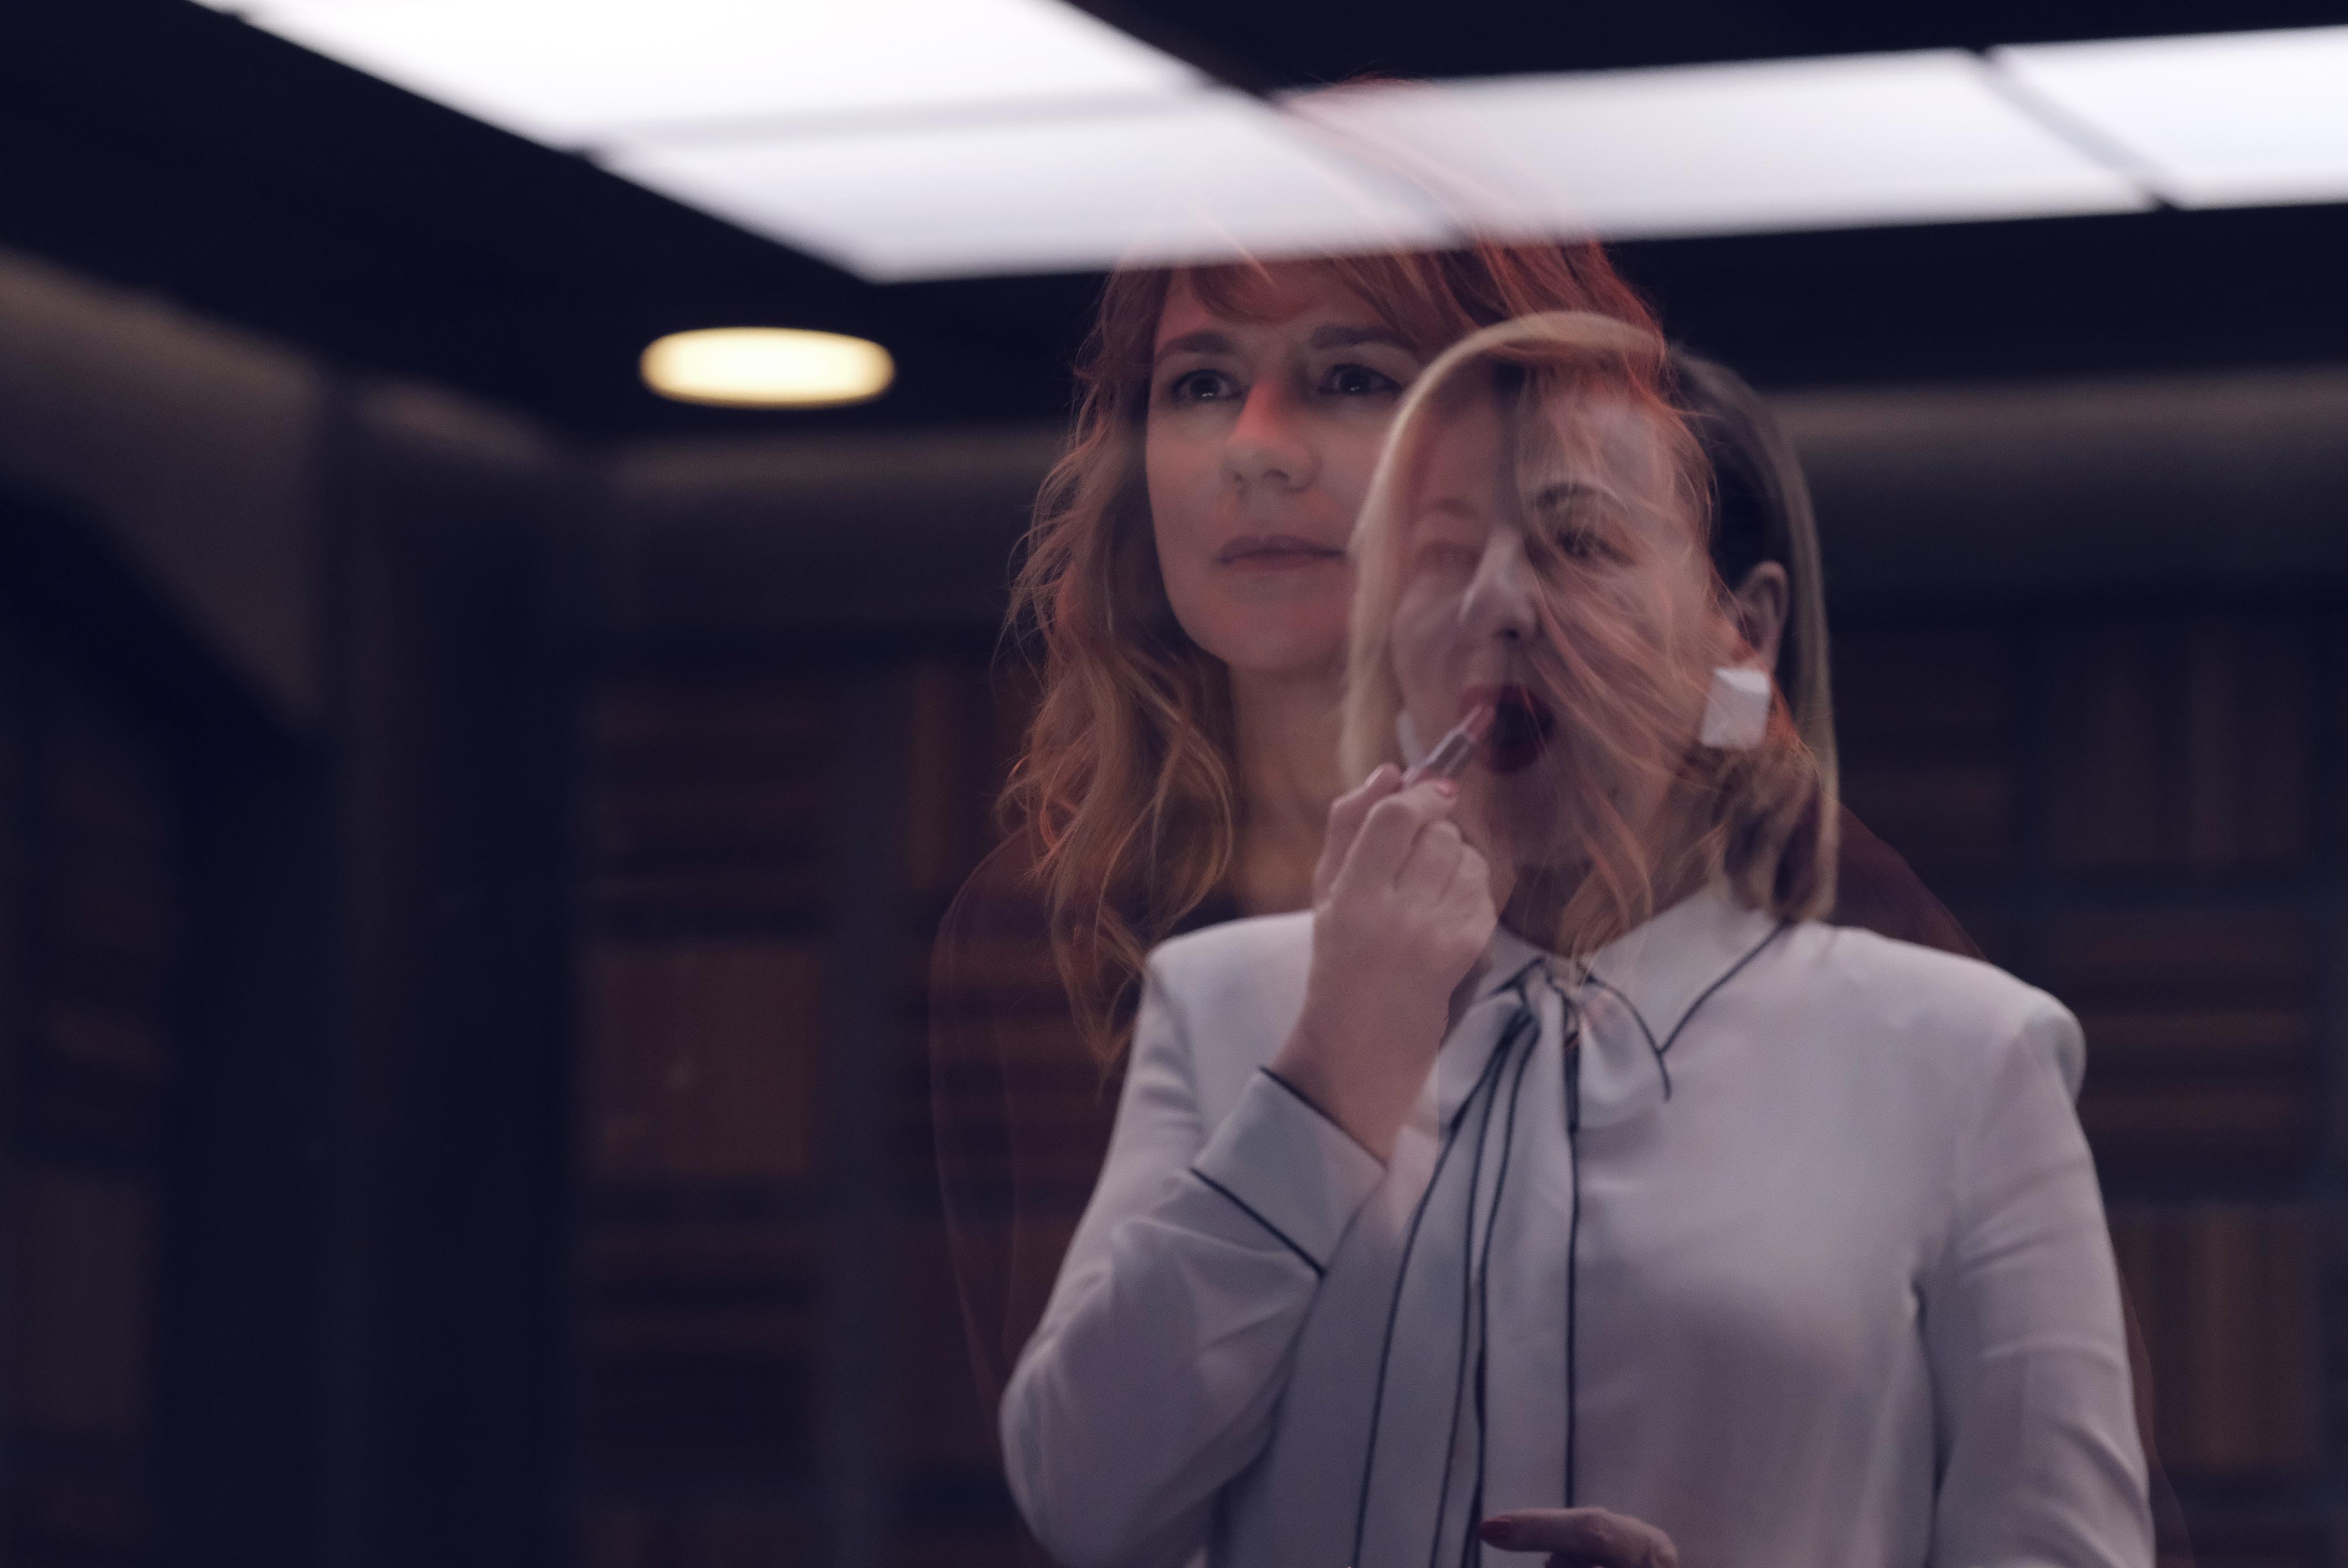 Emma Suárez and Carmen Machi in Criminal: Spain (2019)